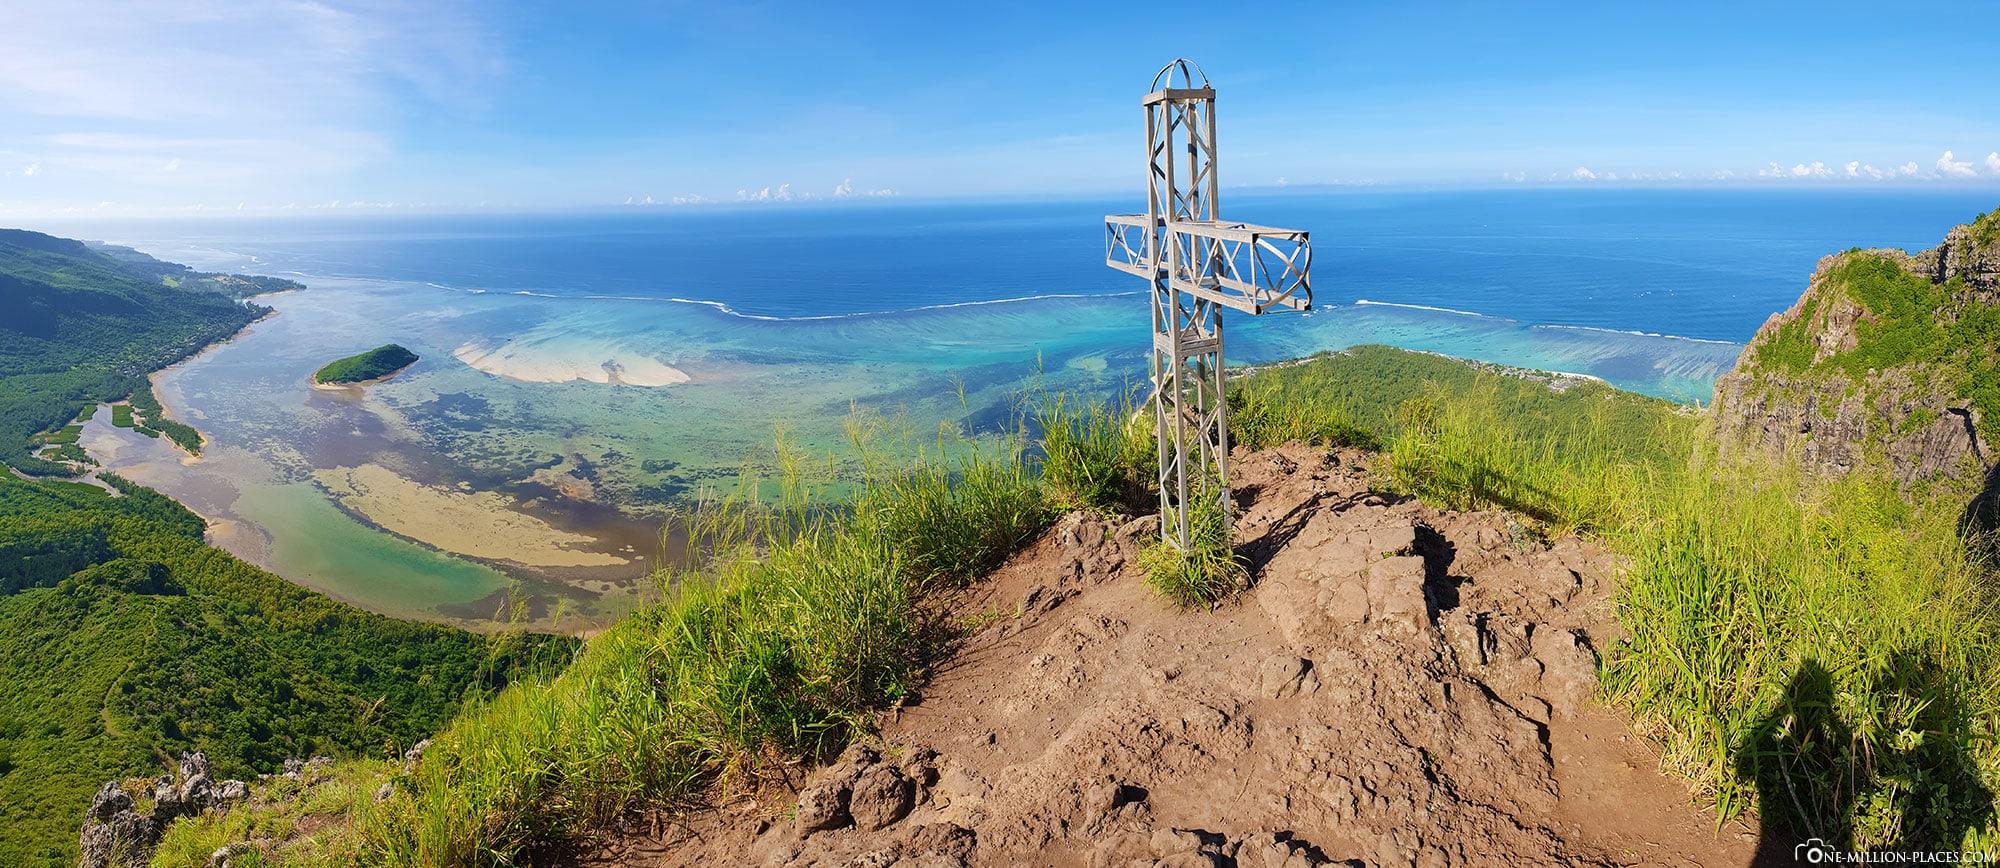 Panorama, Le Morne Brabant, View, Summit, Hike, Mauritius, Hike, TravelReport